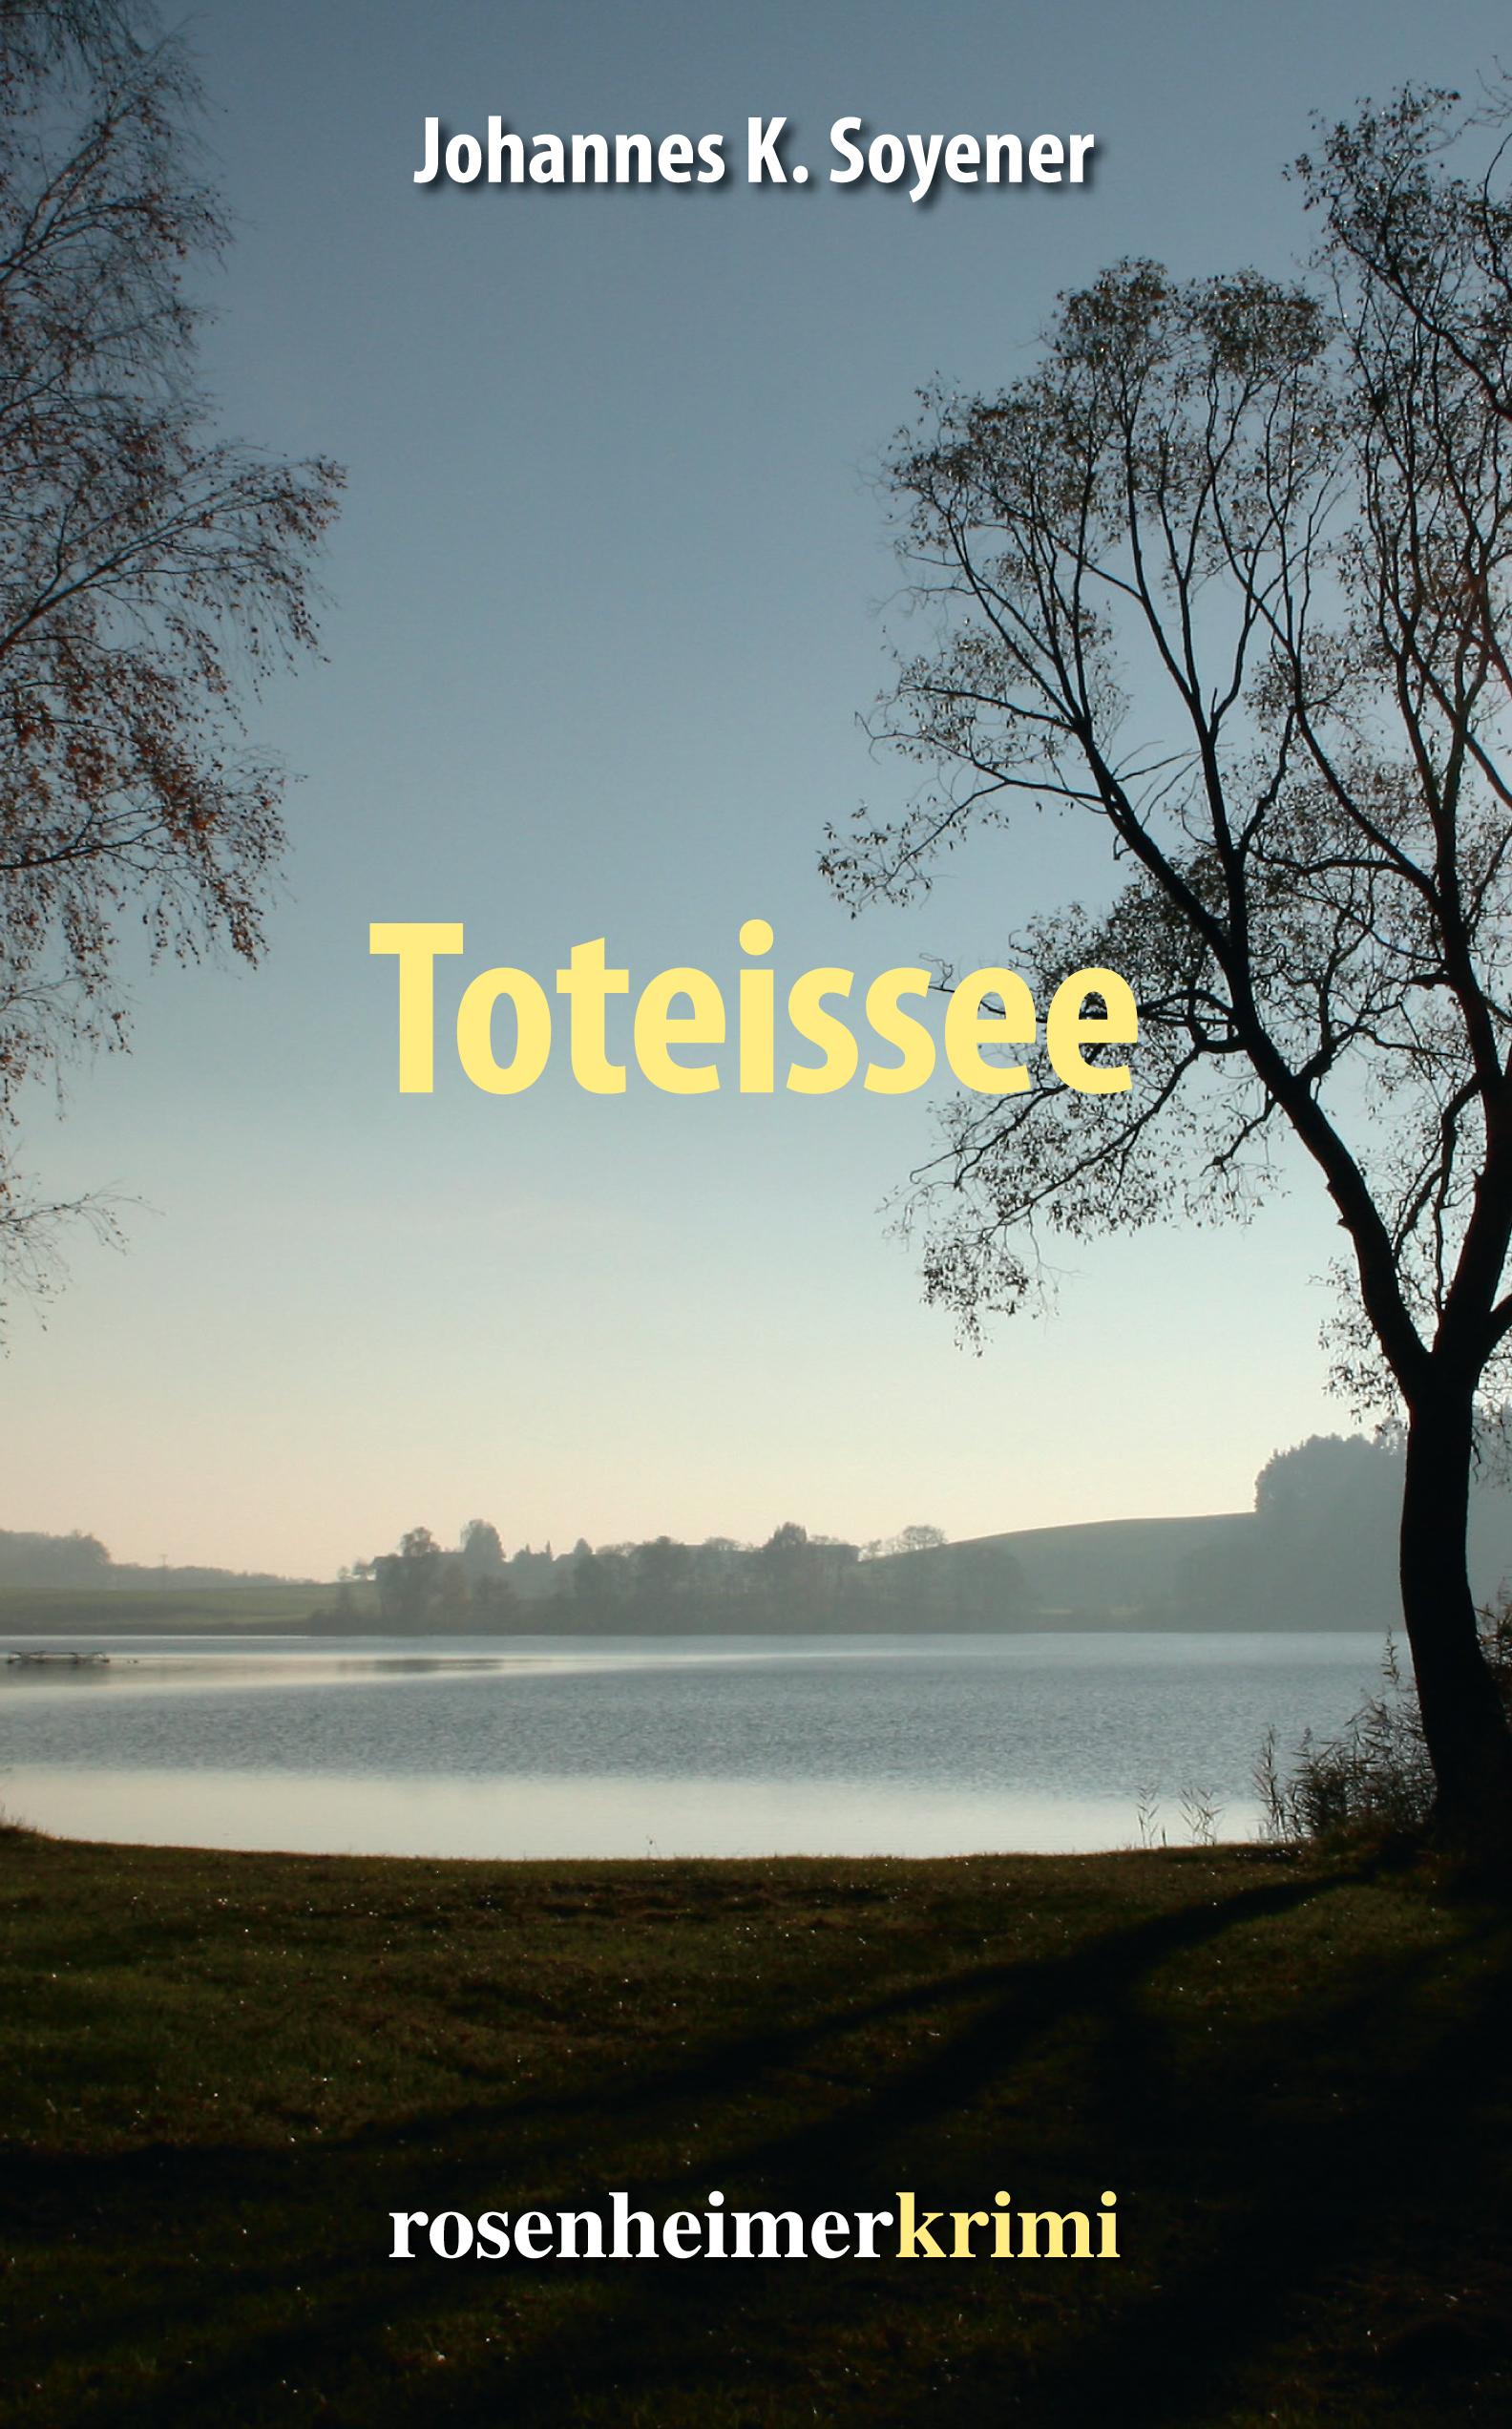 Johannes K. Soyener Toteissee